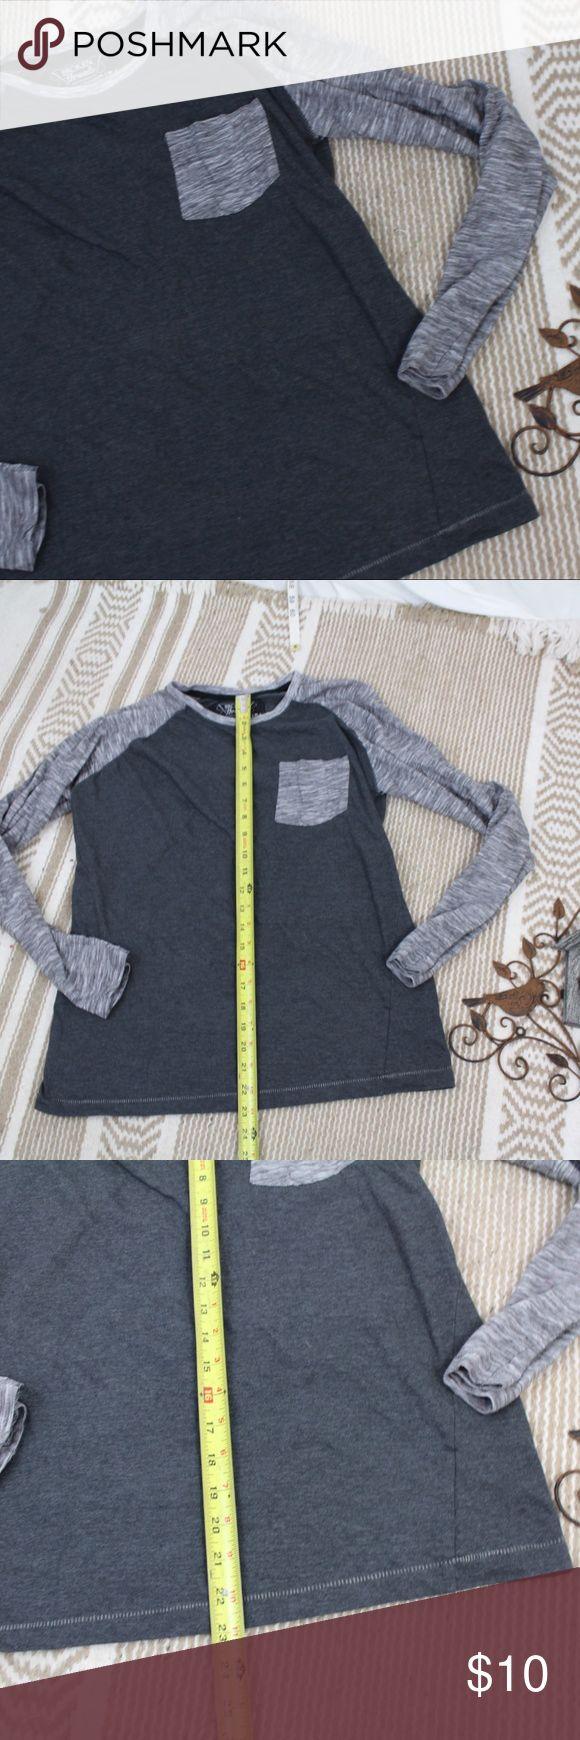 "Broken Threads Medium Long Sleeve Henley Shirt Broken Threads Medium Long Sleeve Henley Shirt pocket gray black  armpit to armpit 17"" length 23"" Broken Threads Shirts Tees - Long Sleeve"